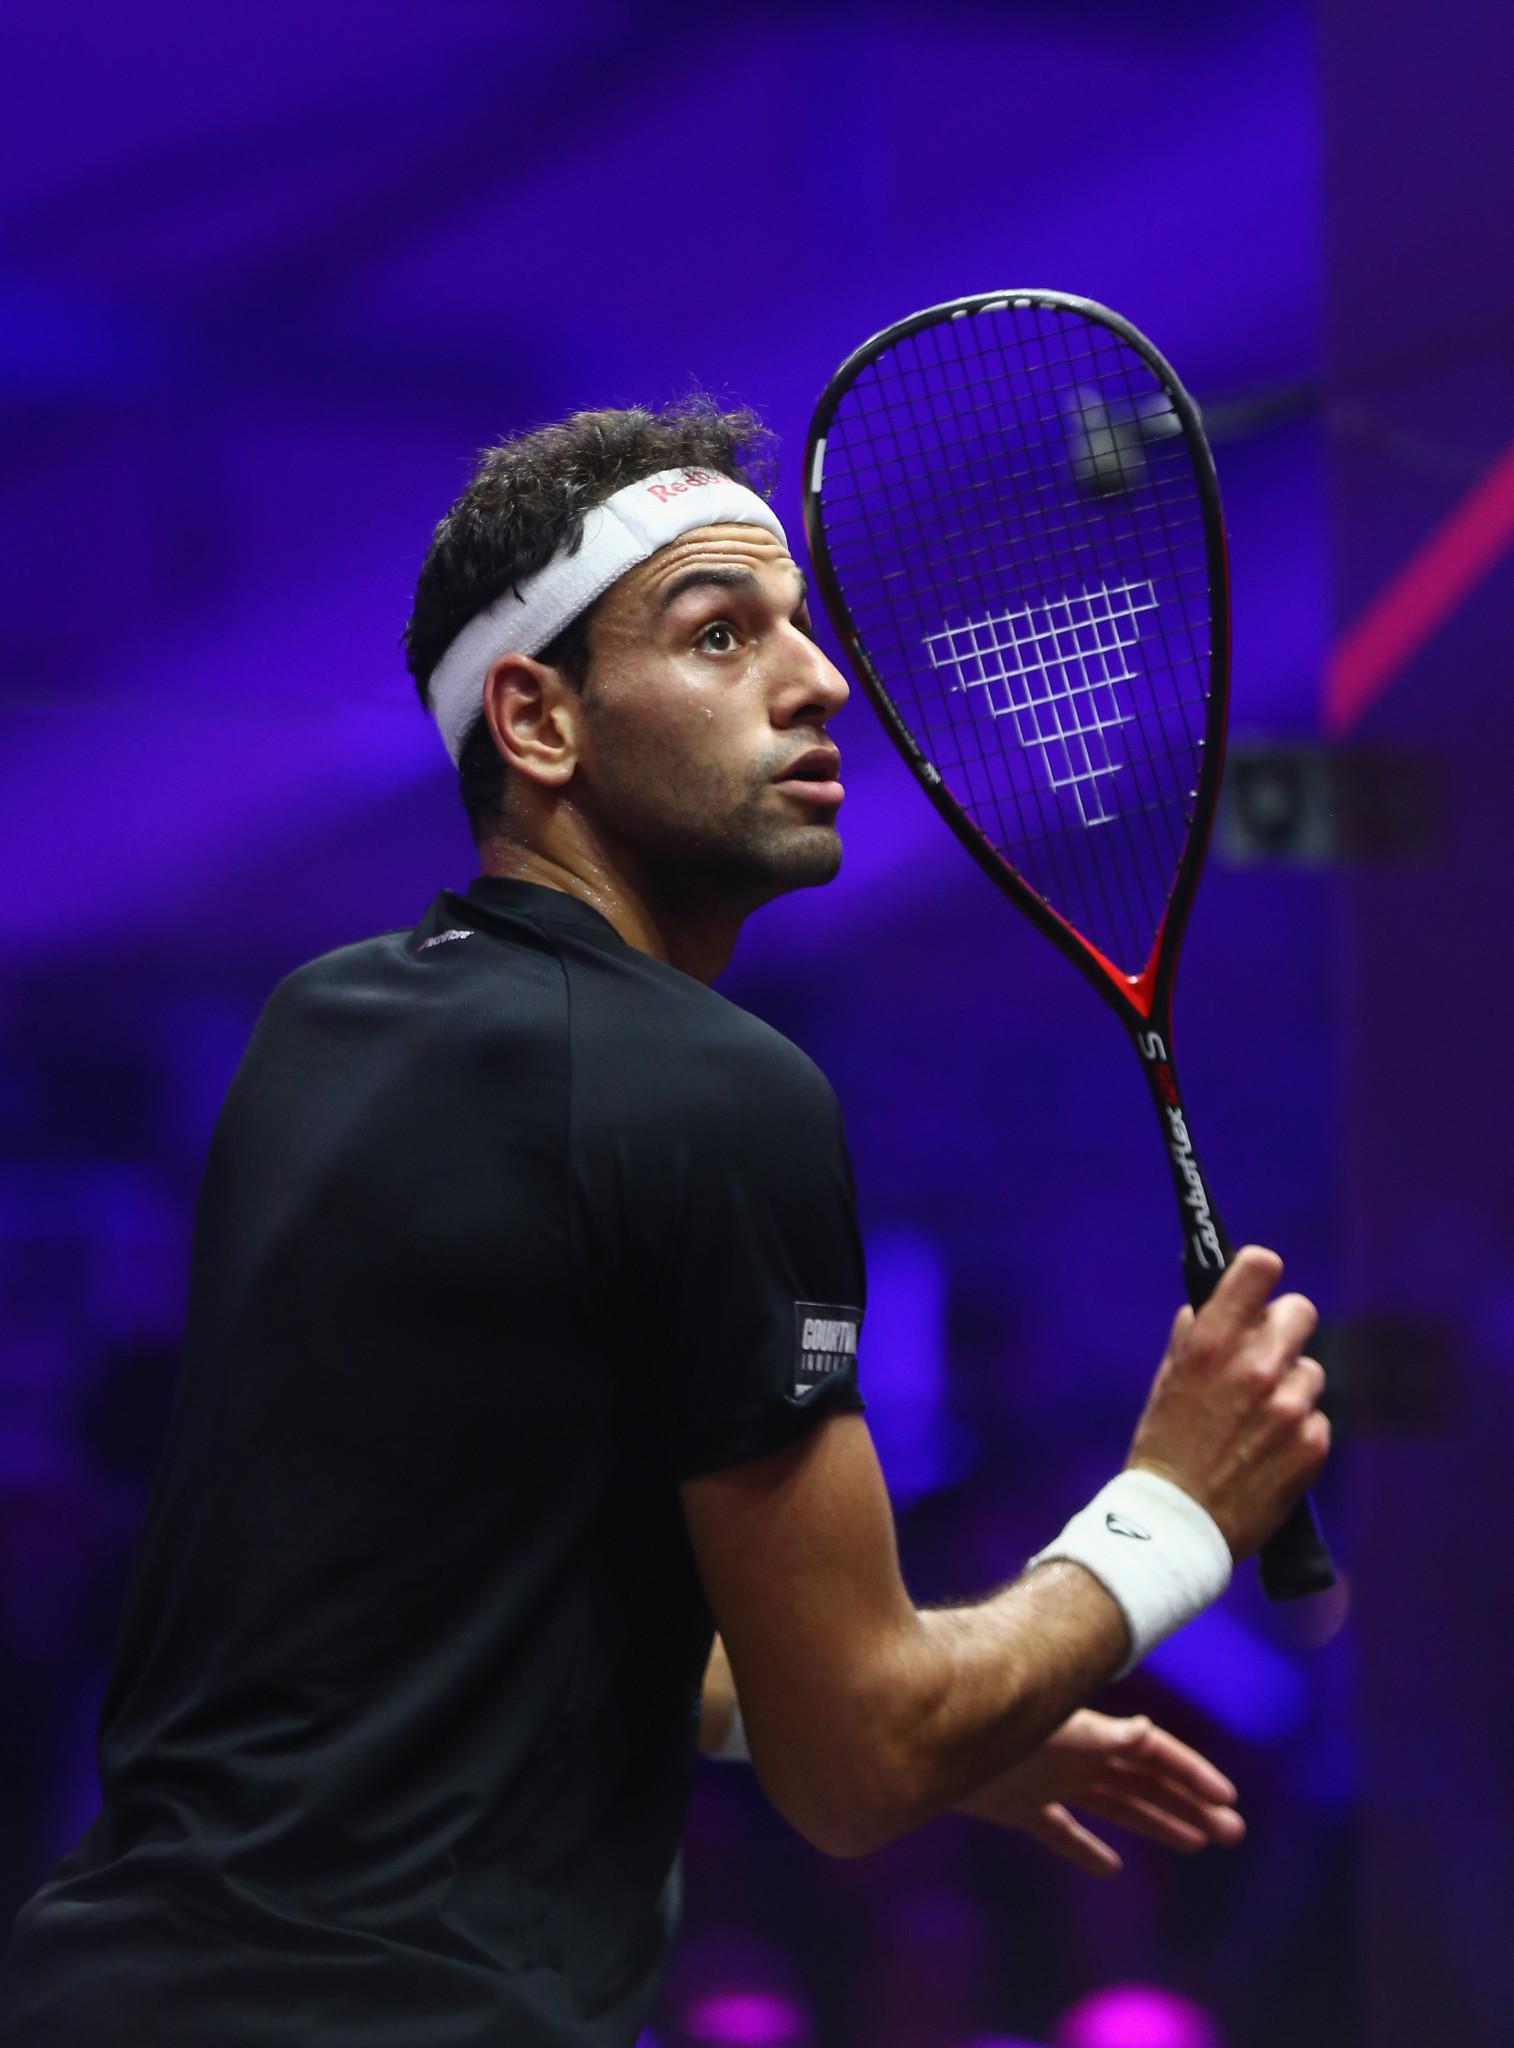 Mohamed Elshorbagy is the reigning men's PSA World Series Finals champion ©Getty Images